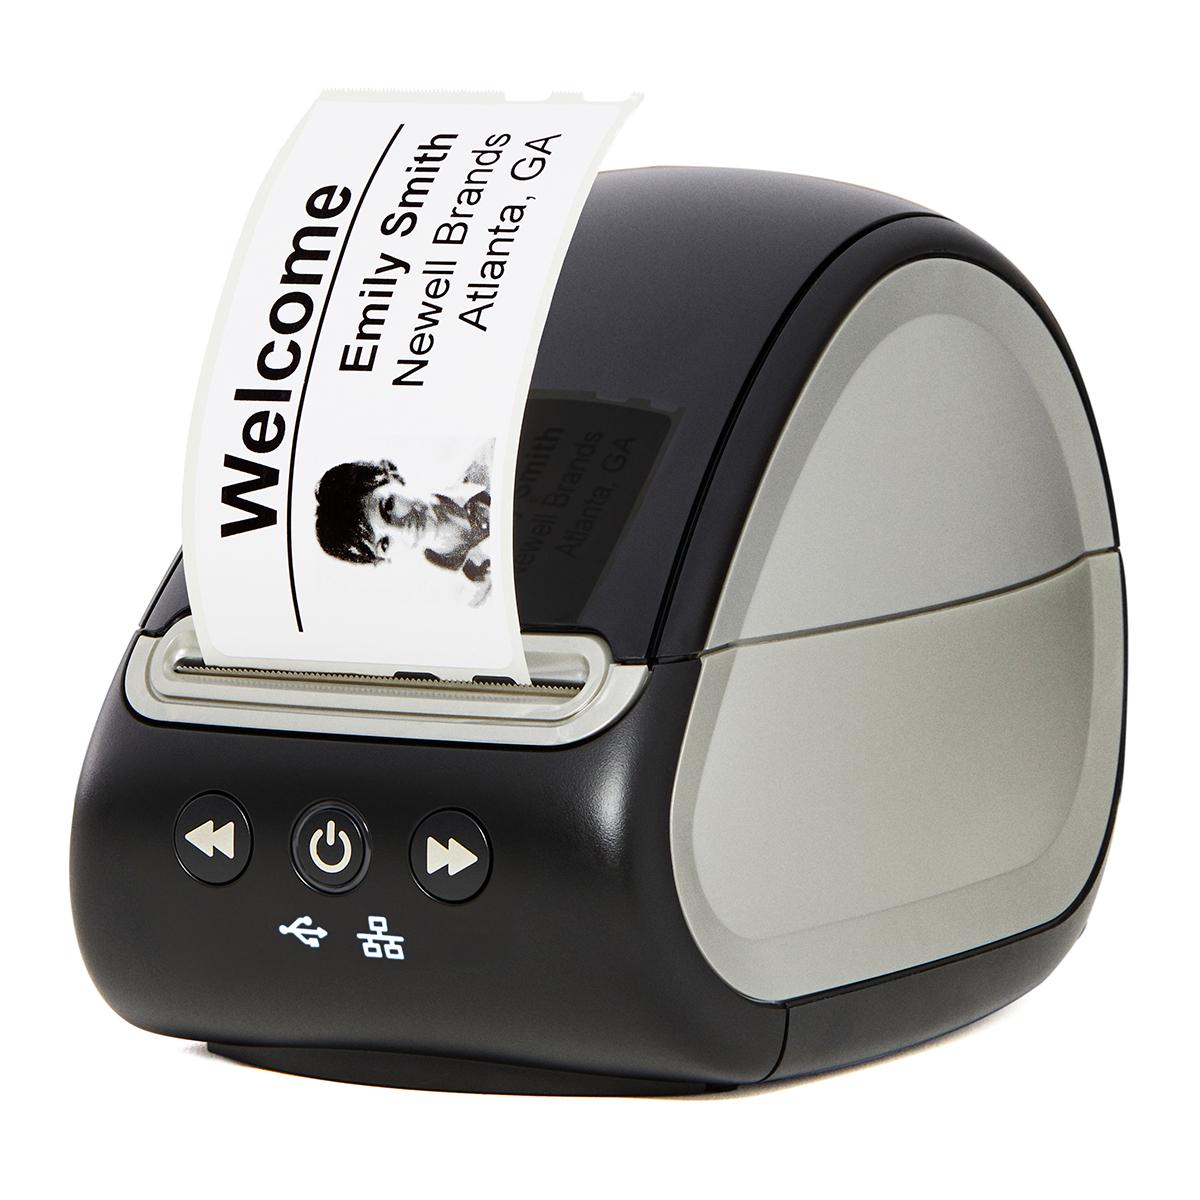 Dymo Labelwriter 550 Desktop Label Printer